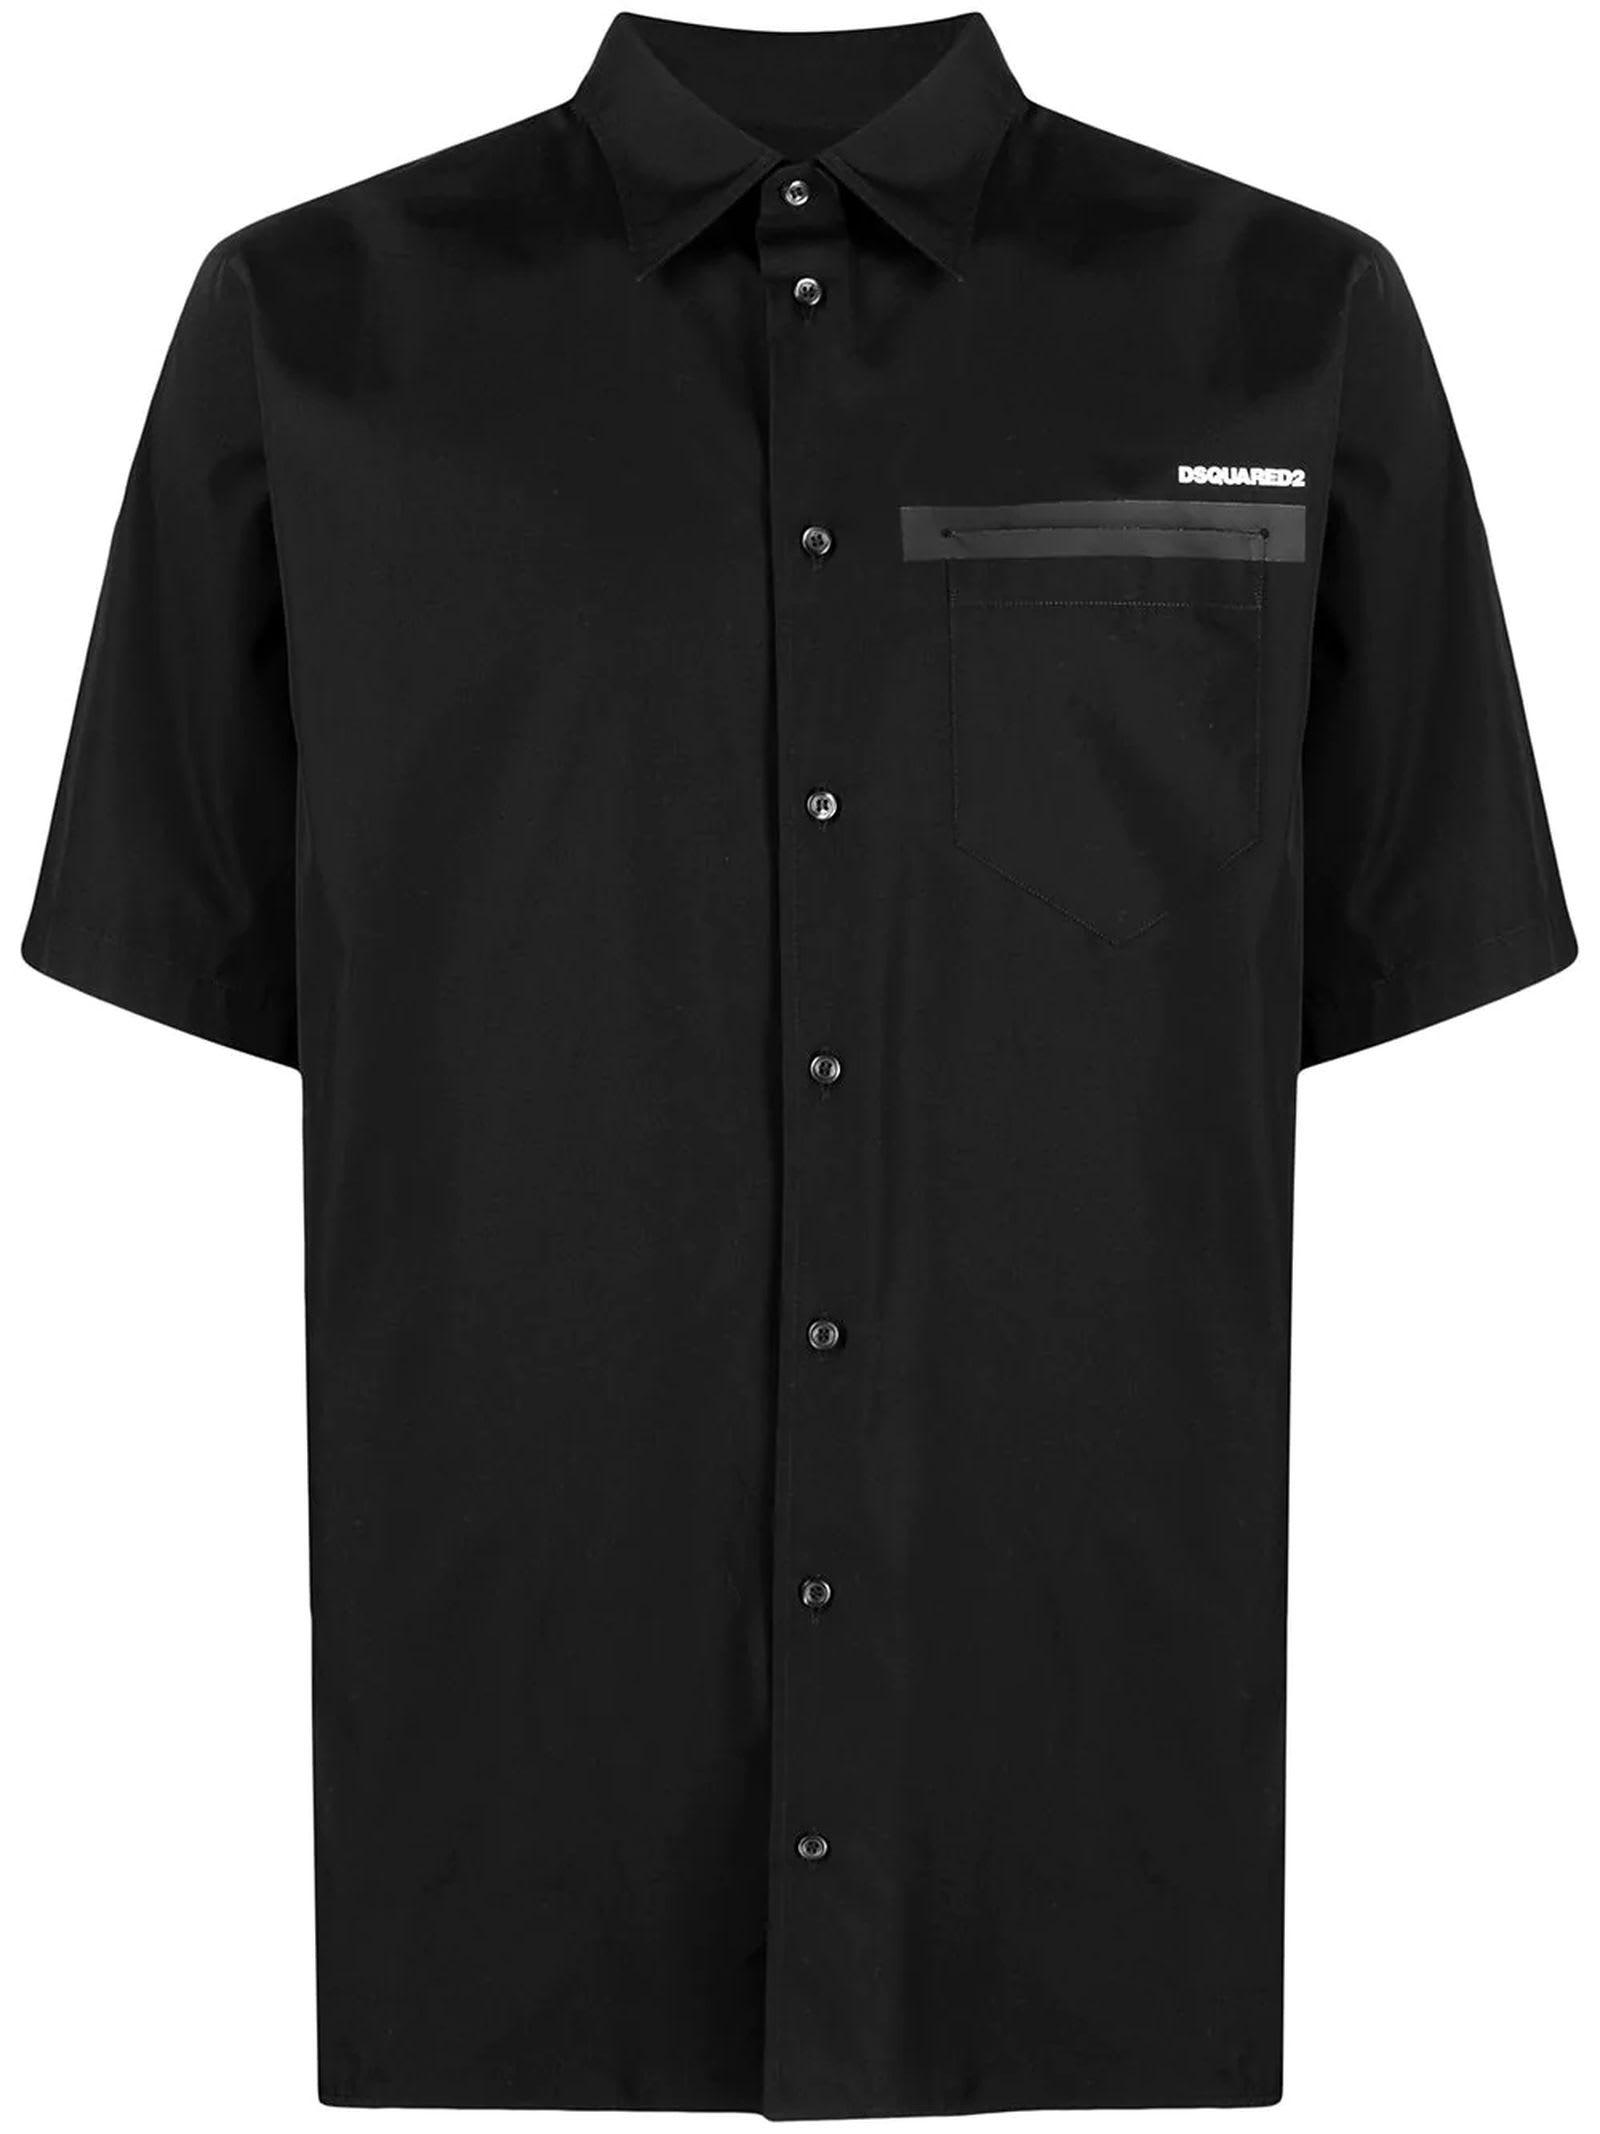 Dsquared2 Black Cotton Shirt